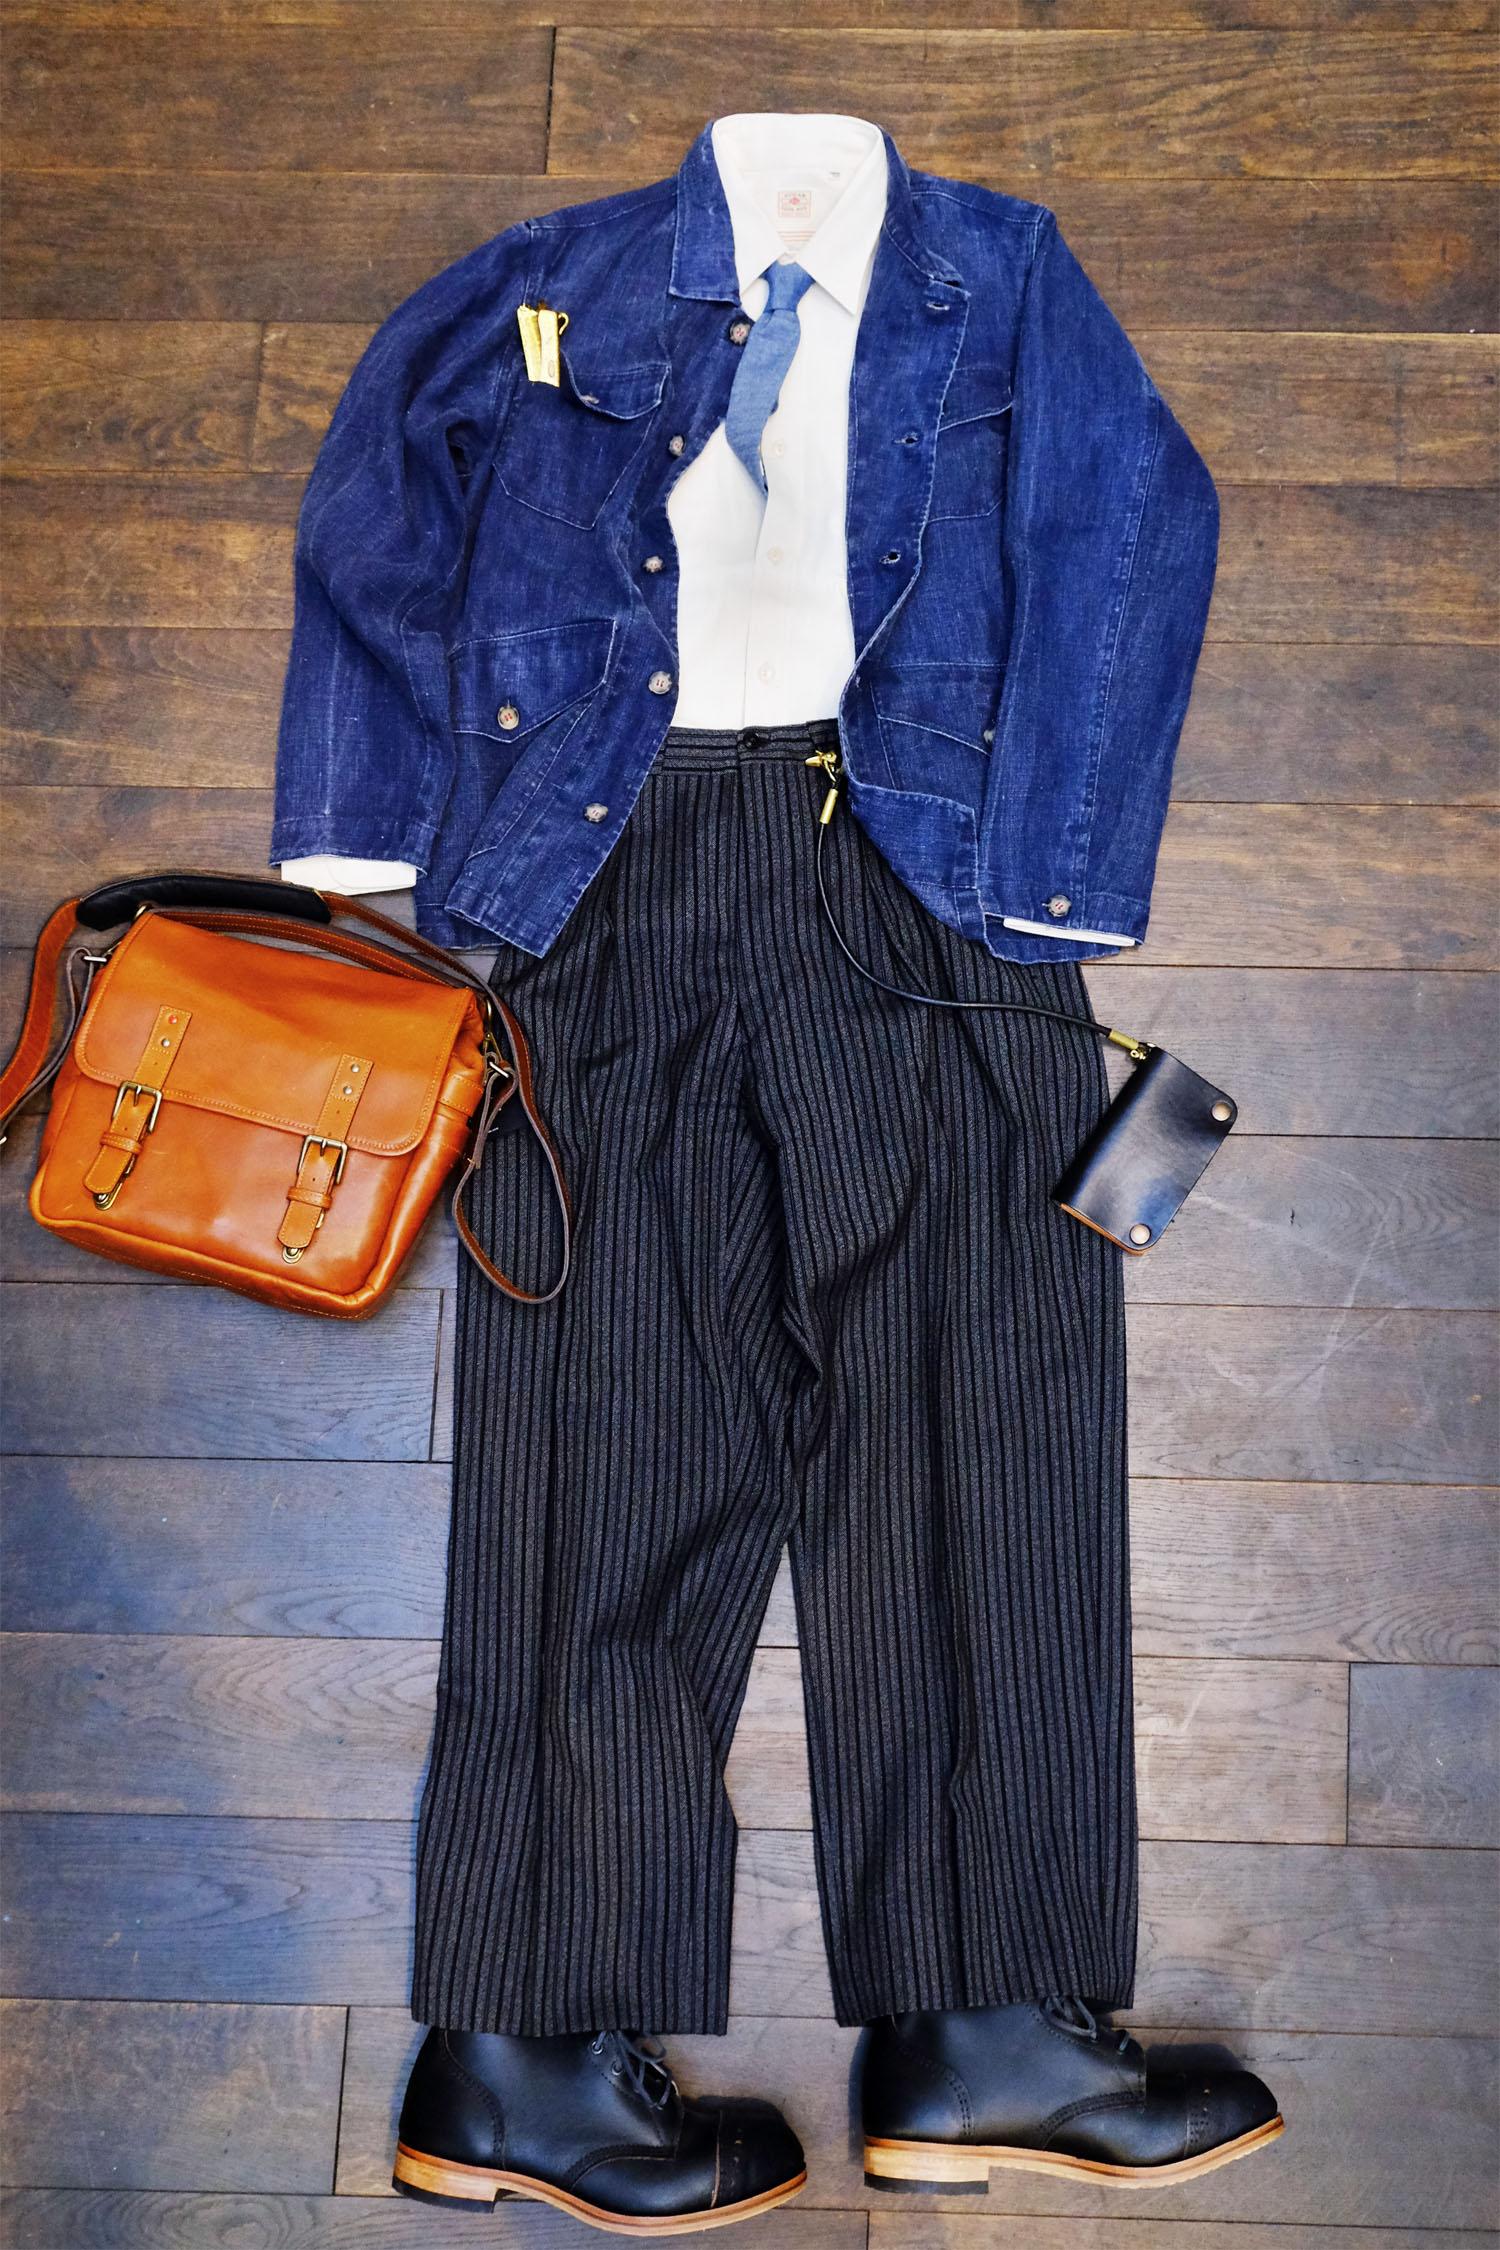 outfit-workjacket-stresemann-hose-krawatte-chambray-sugarcane-gallamini-vintage